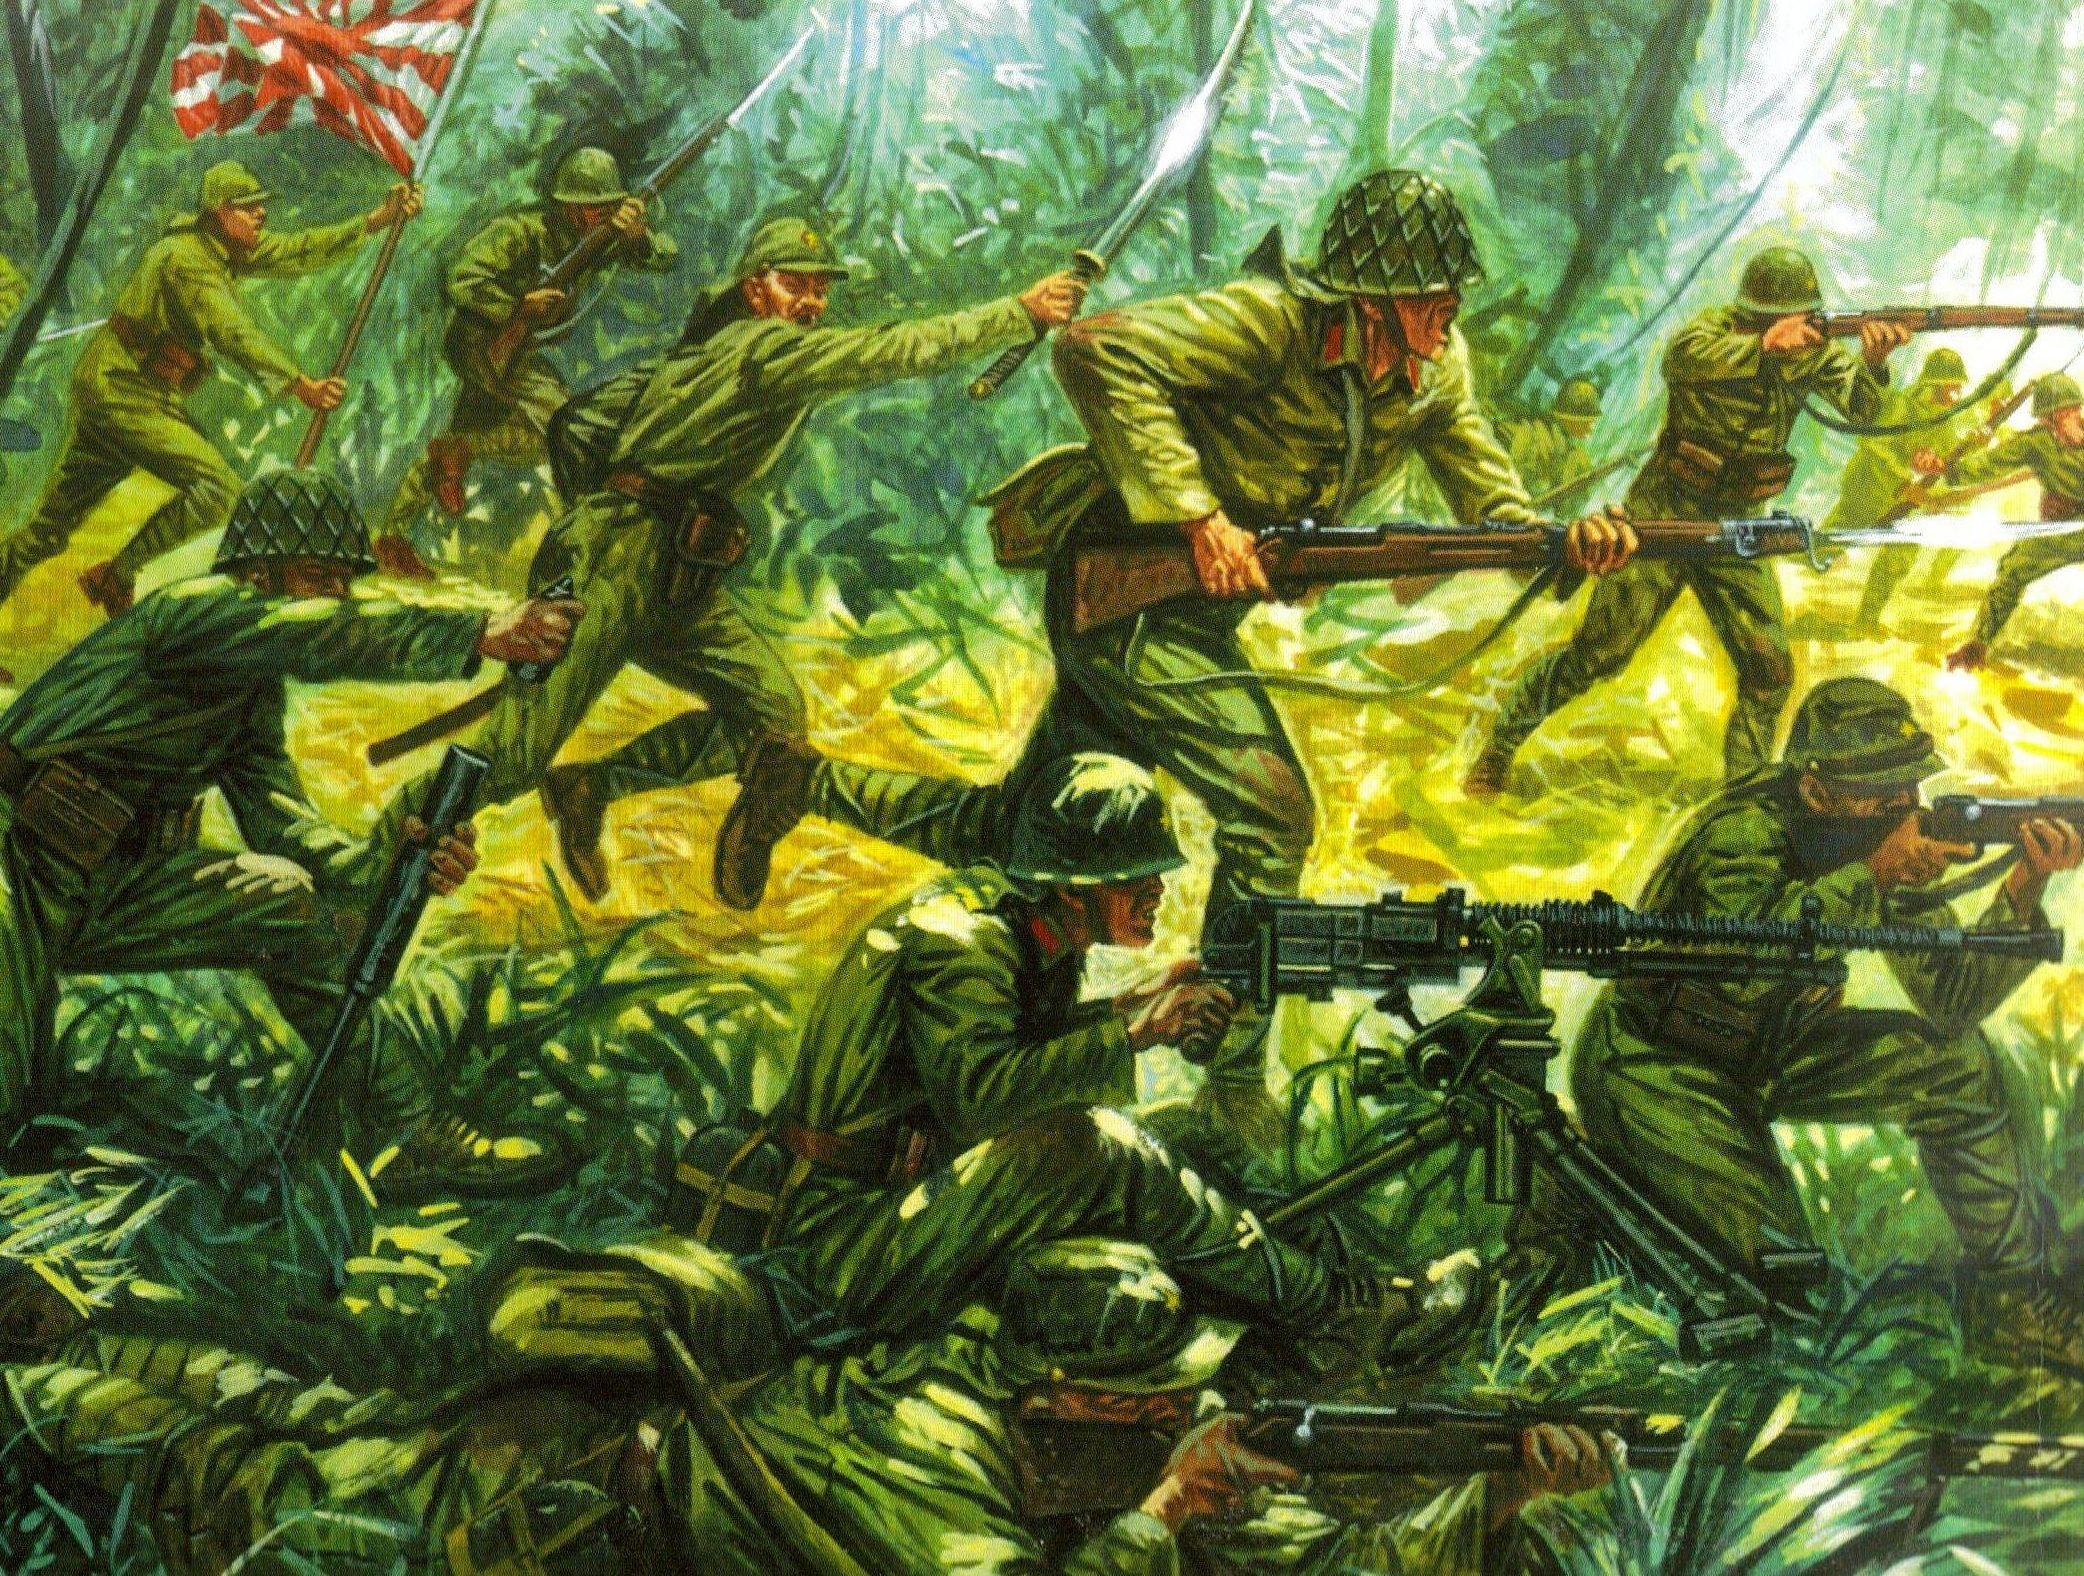 Rava Giuseppe. Японская пехота.